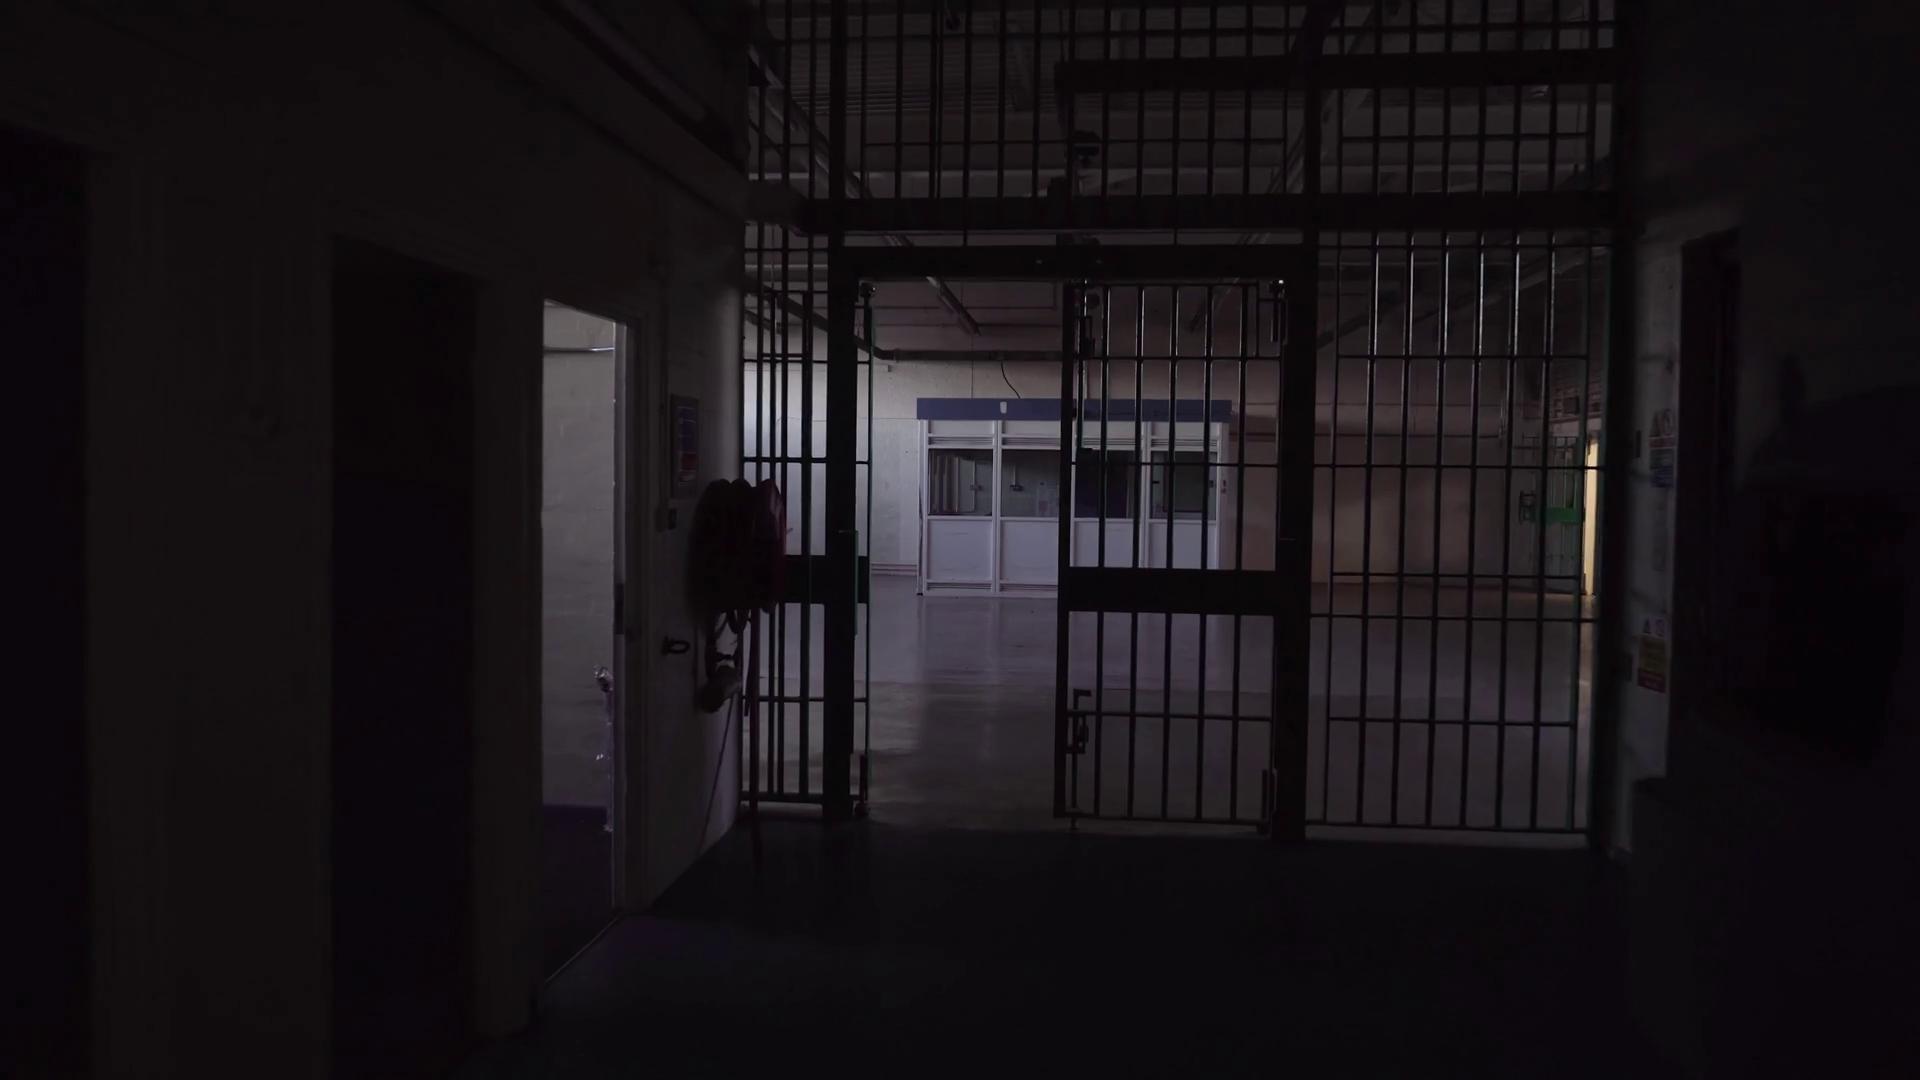 Cinematic Glidecam Inside Prison Corridor, POV Of Prisoner Walking ...